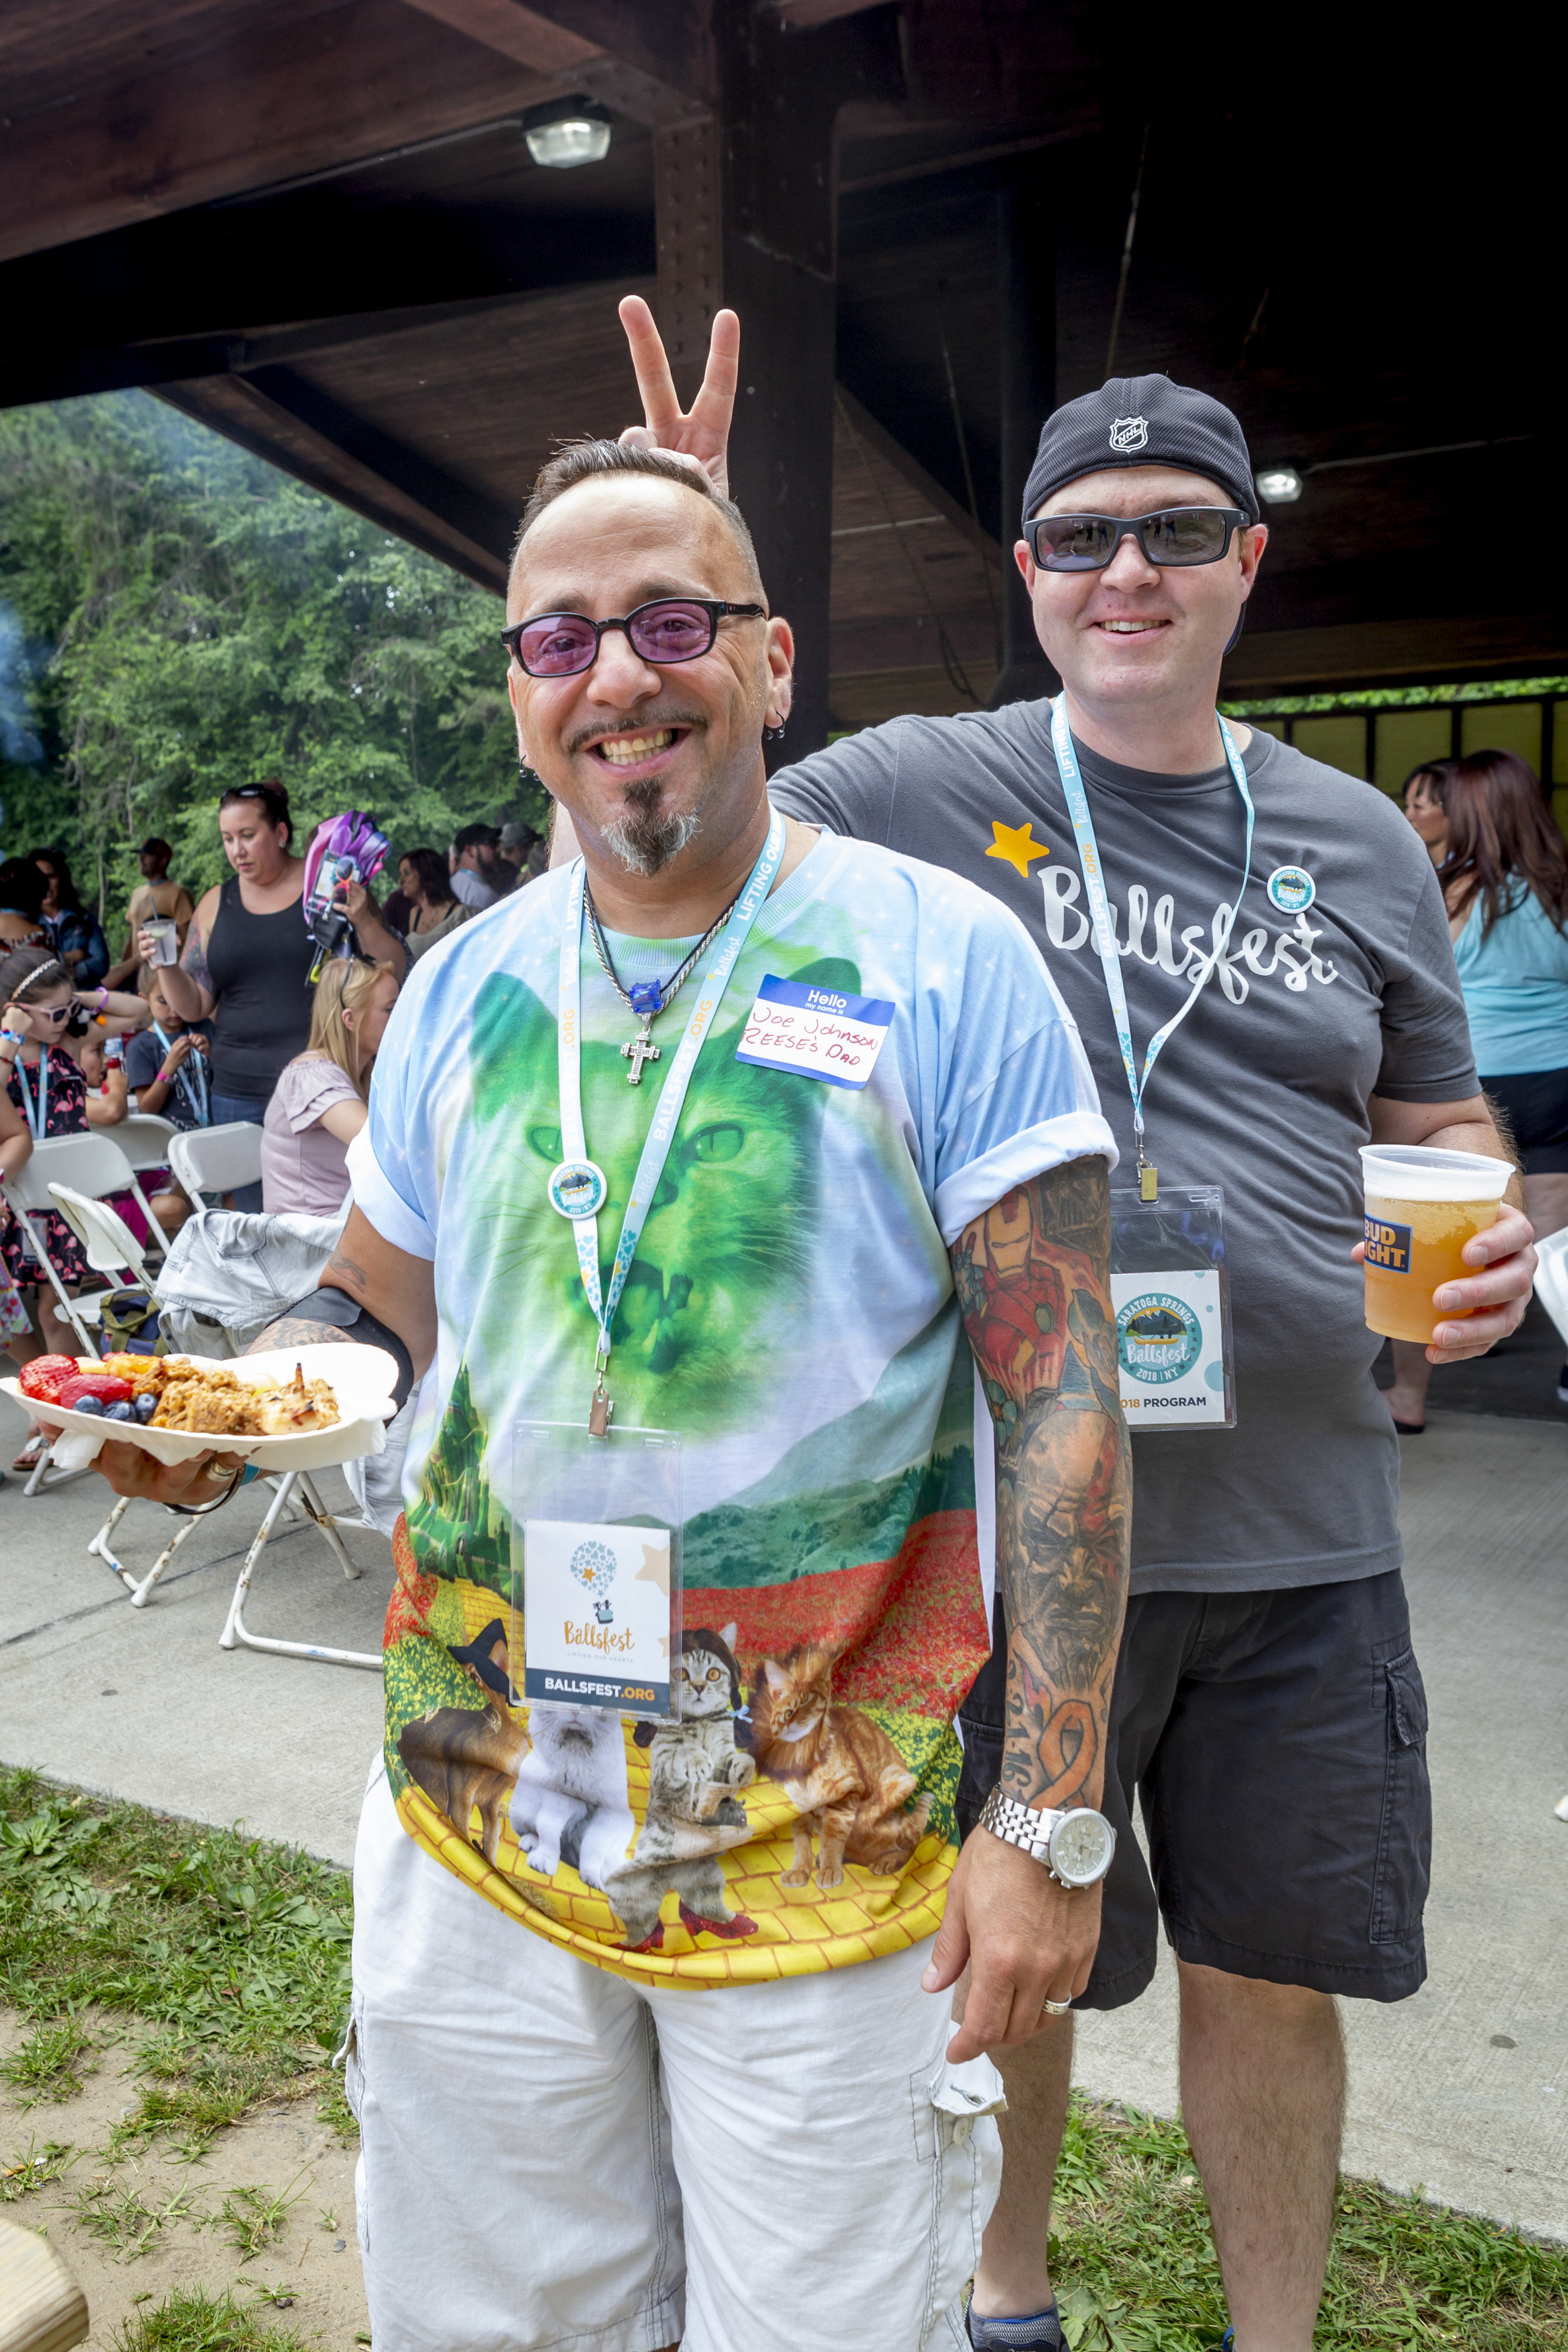 (2018.07.14) Ballsfest Saratoga Spa State Park-3778.jpg